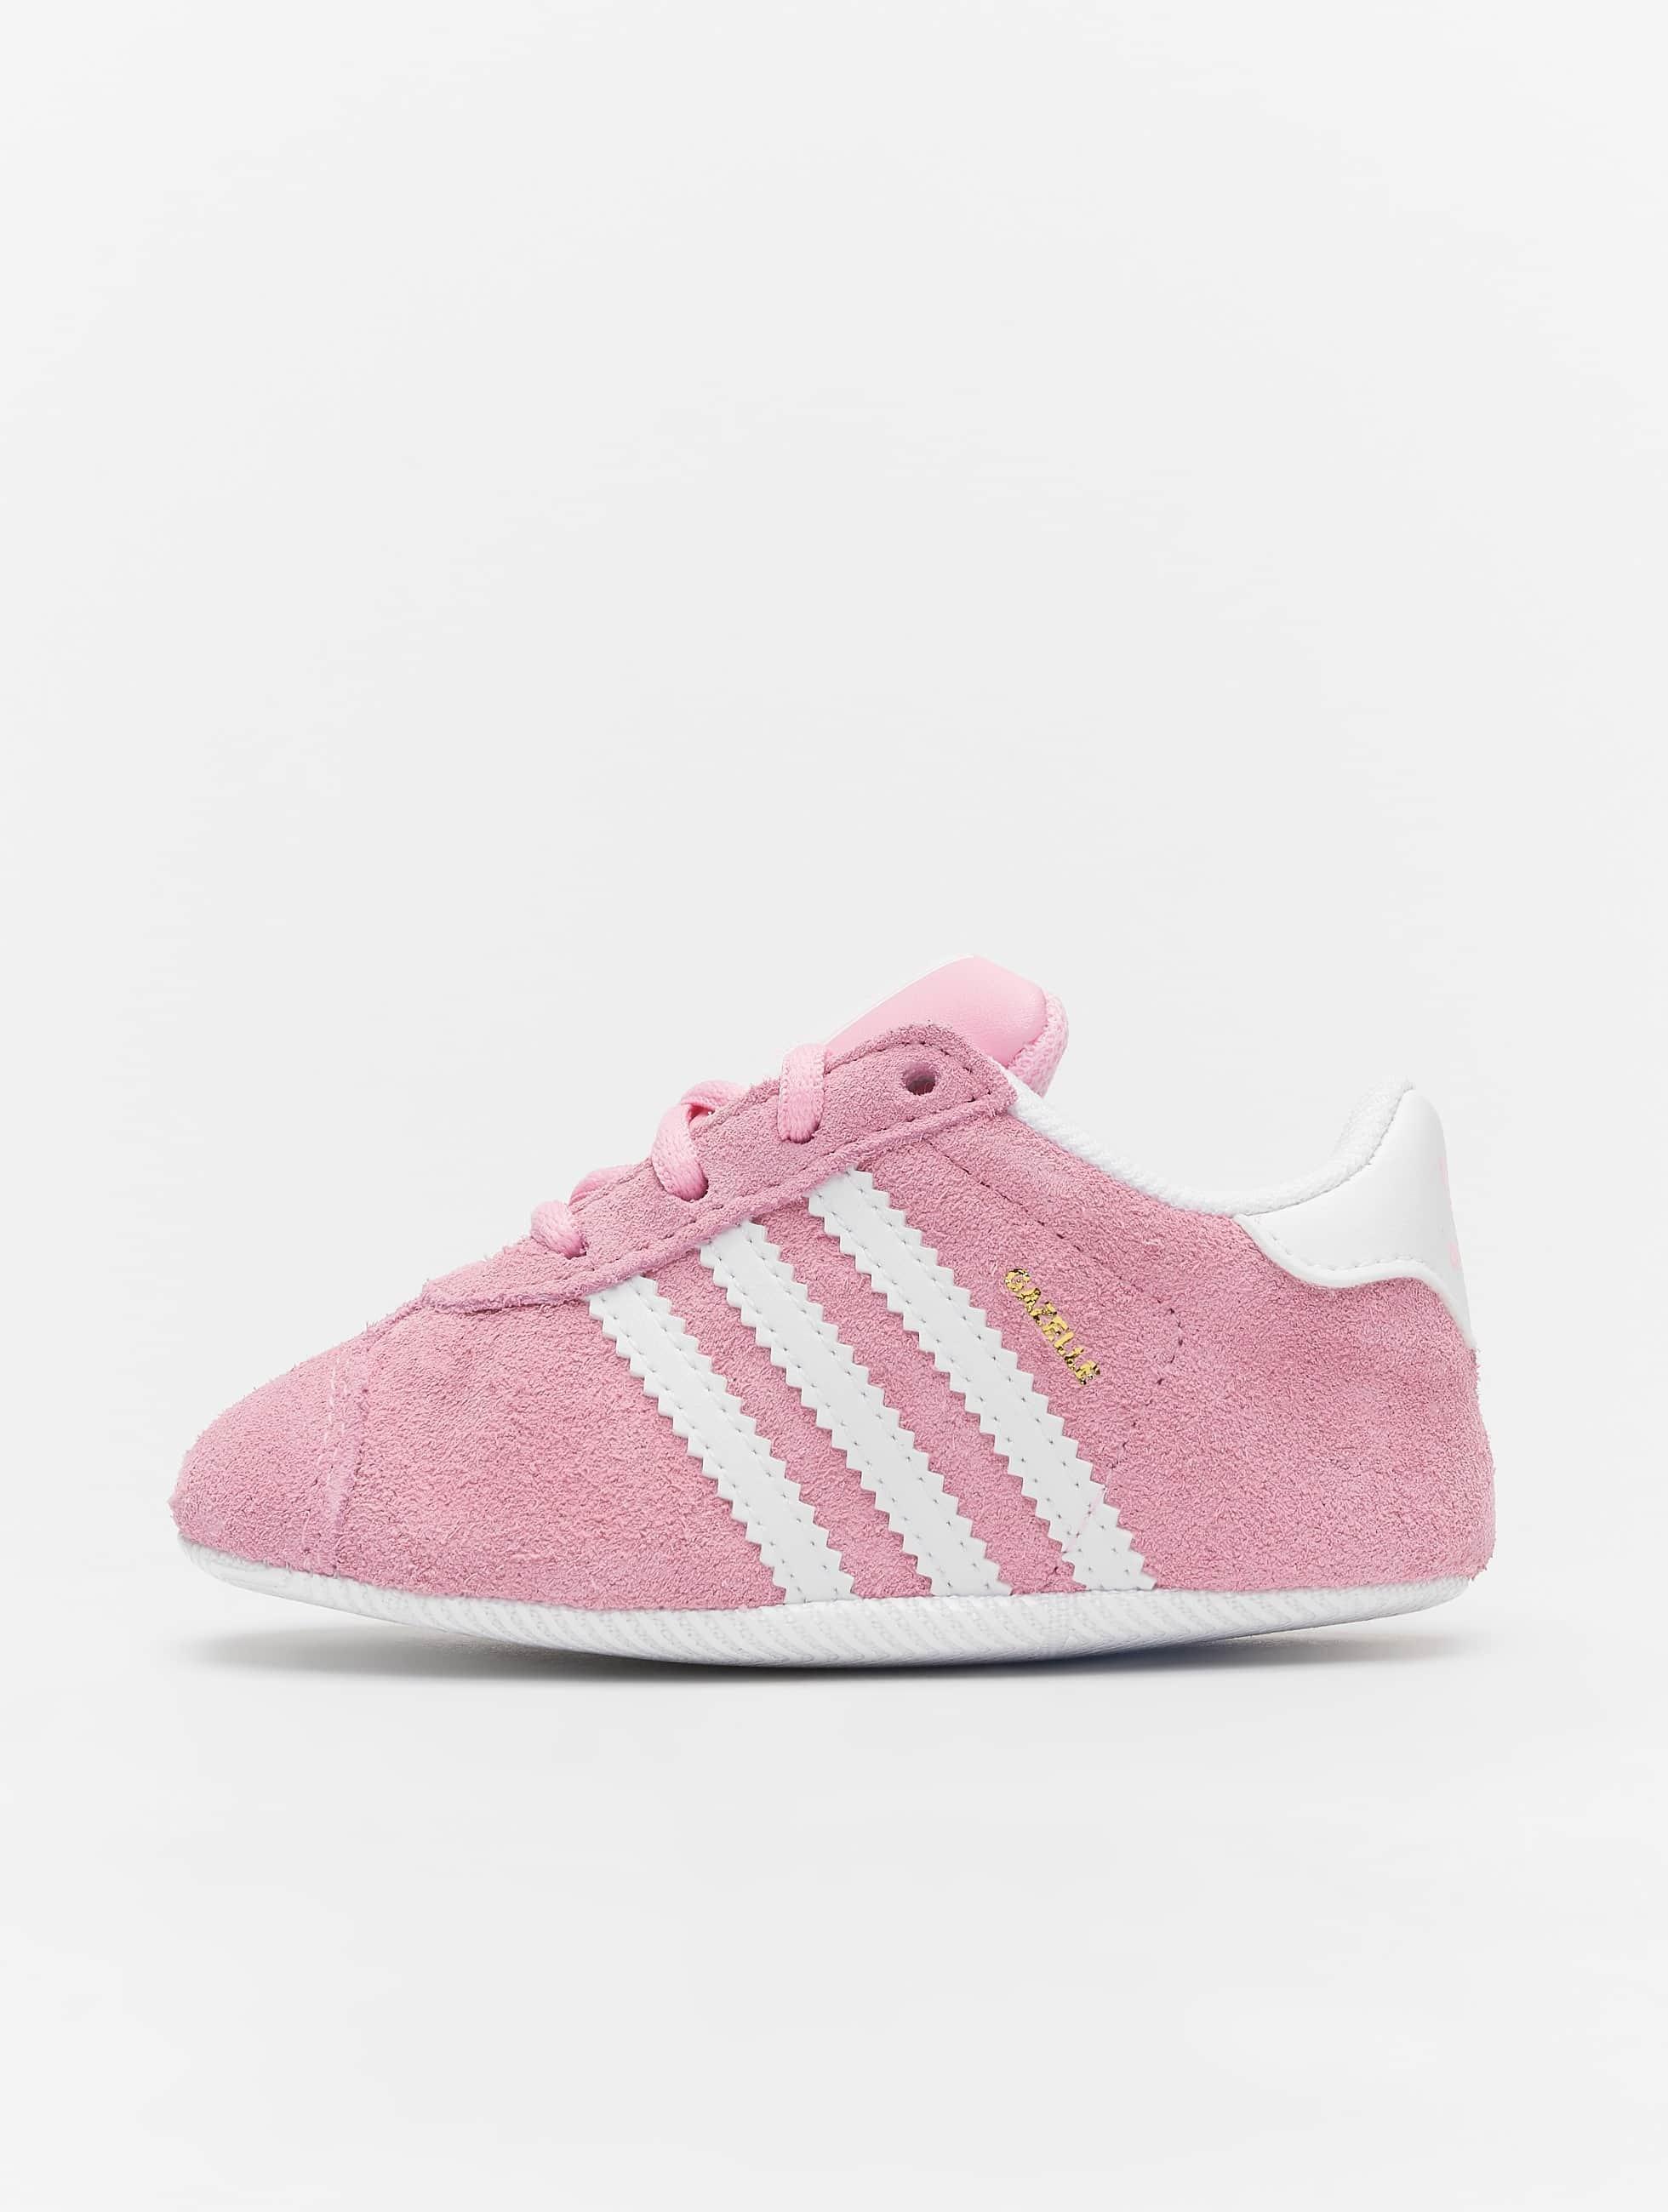 Adidas Originals Gazelle Crib Sneakers True Pink